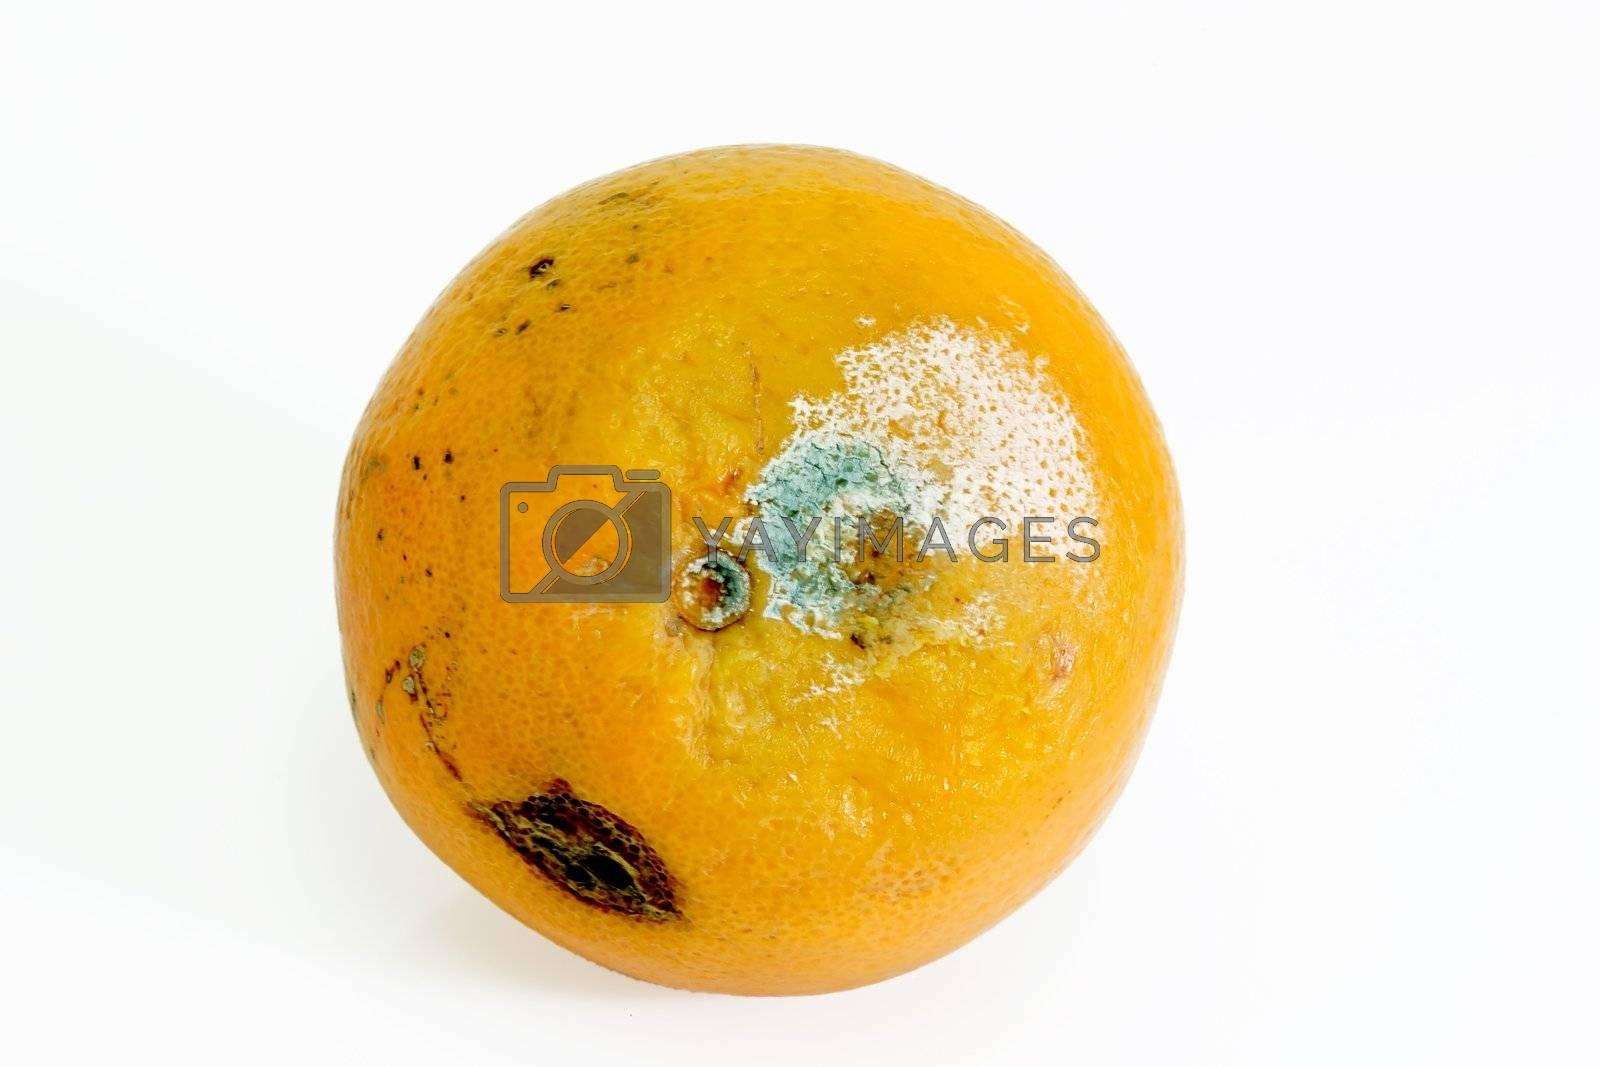 Mouldy orange by Teamarbeit